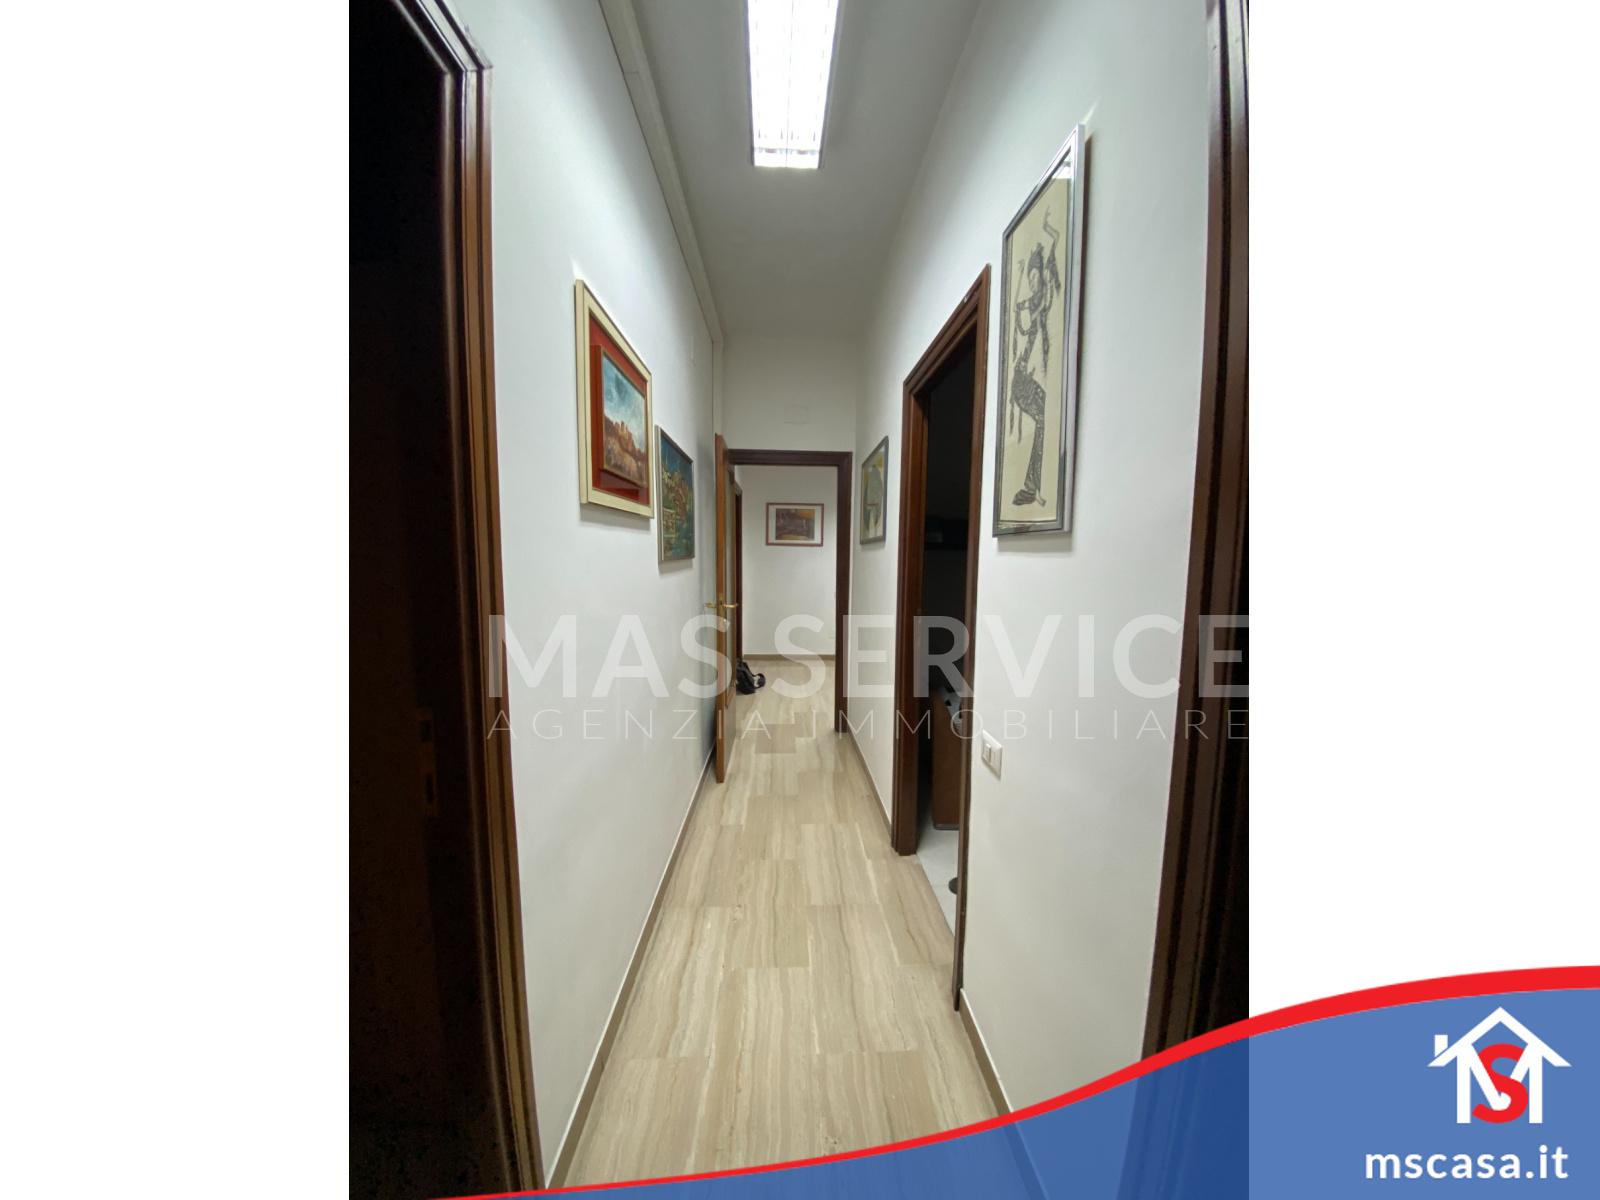 Appartamento in vendita zona Montagnola a Roma Vista Corridoio